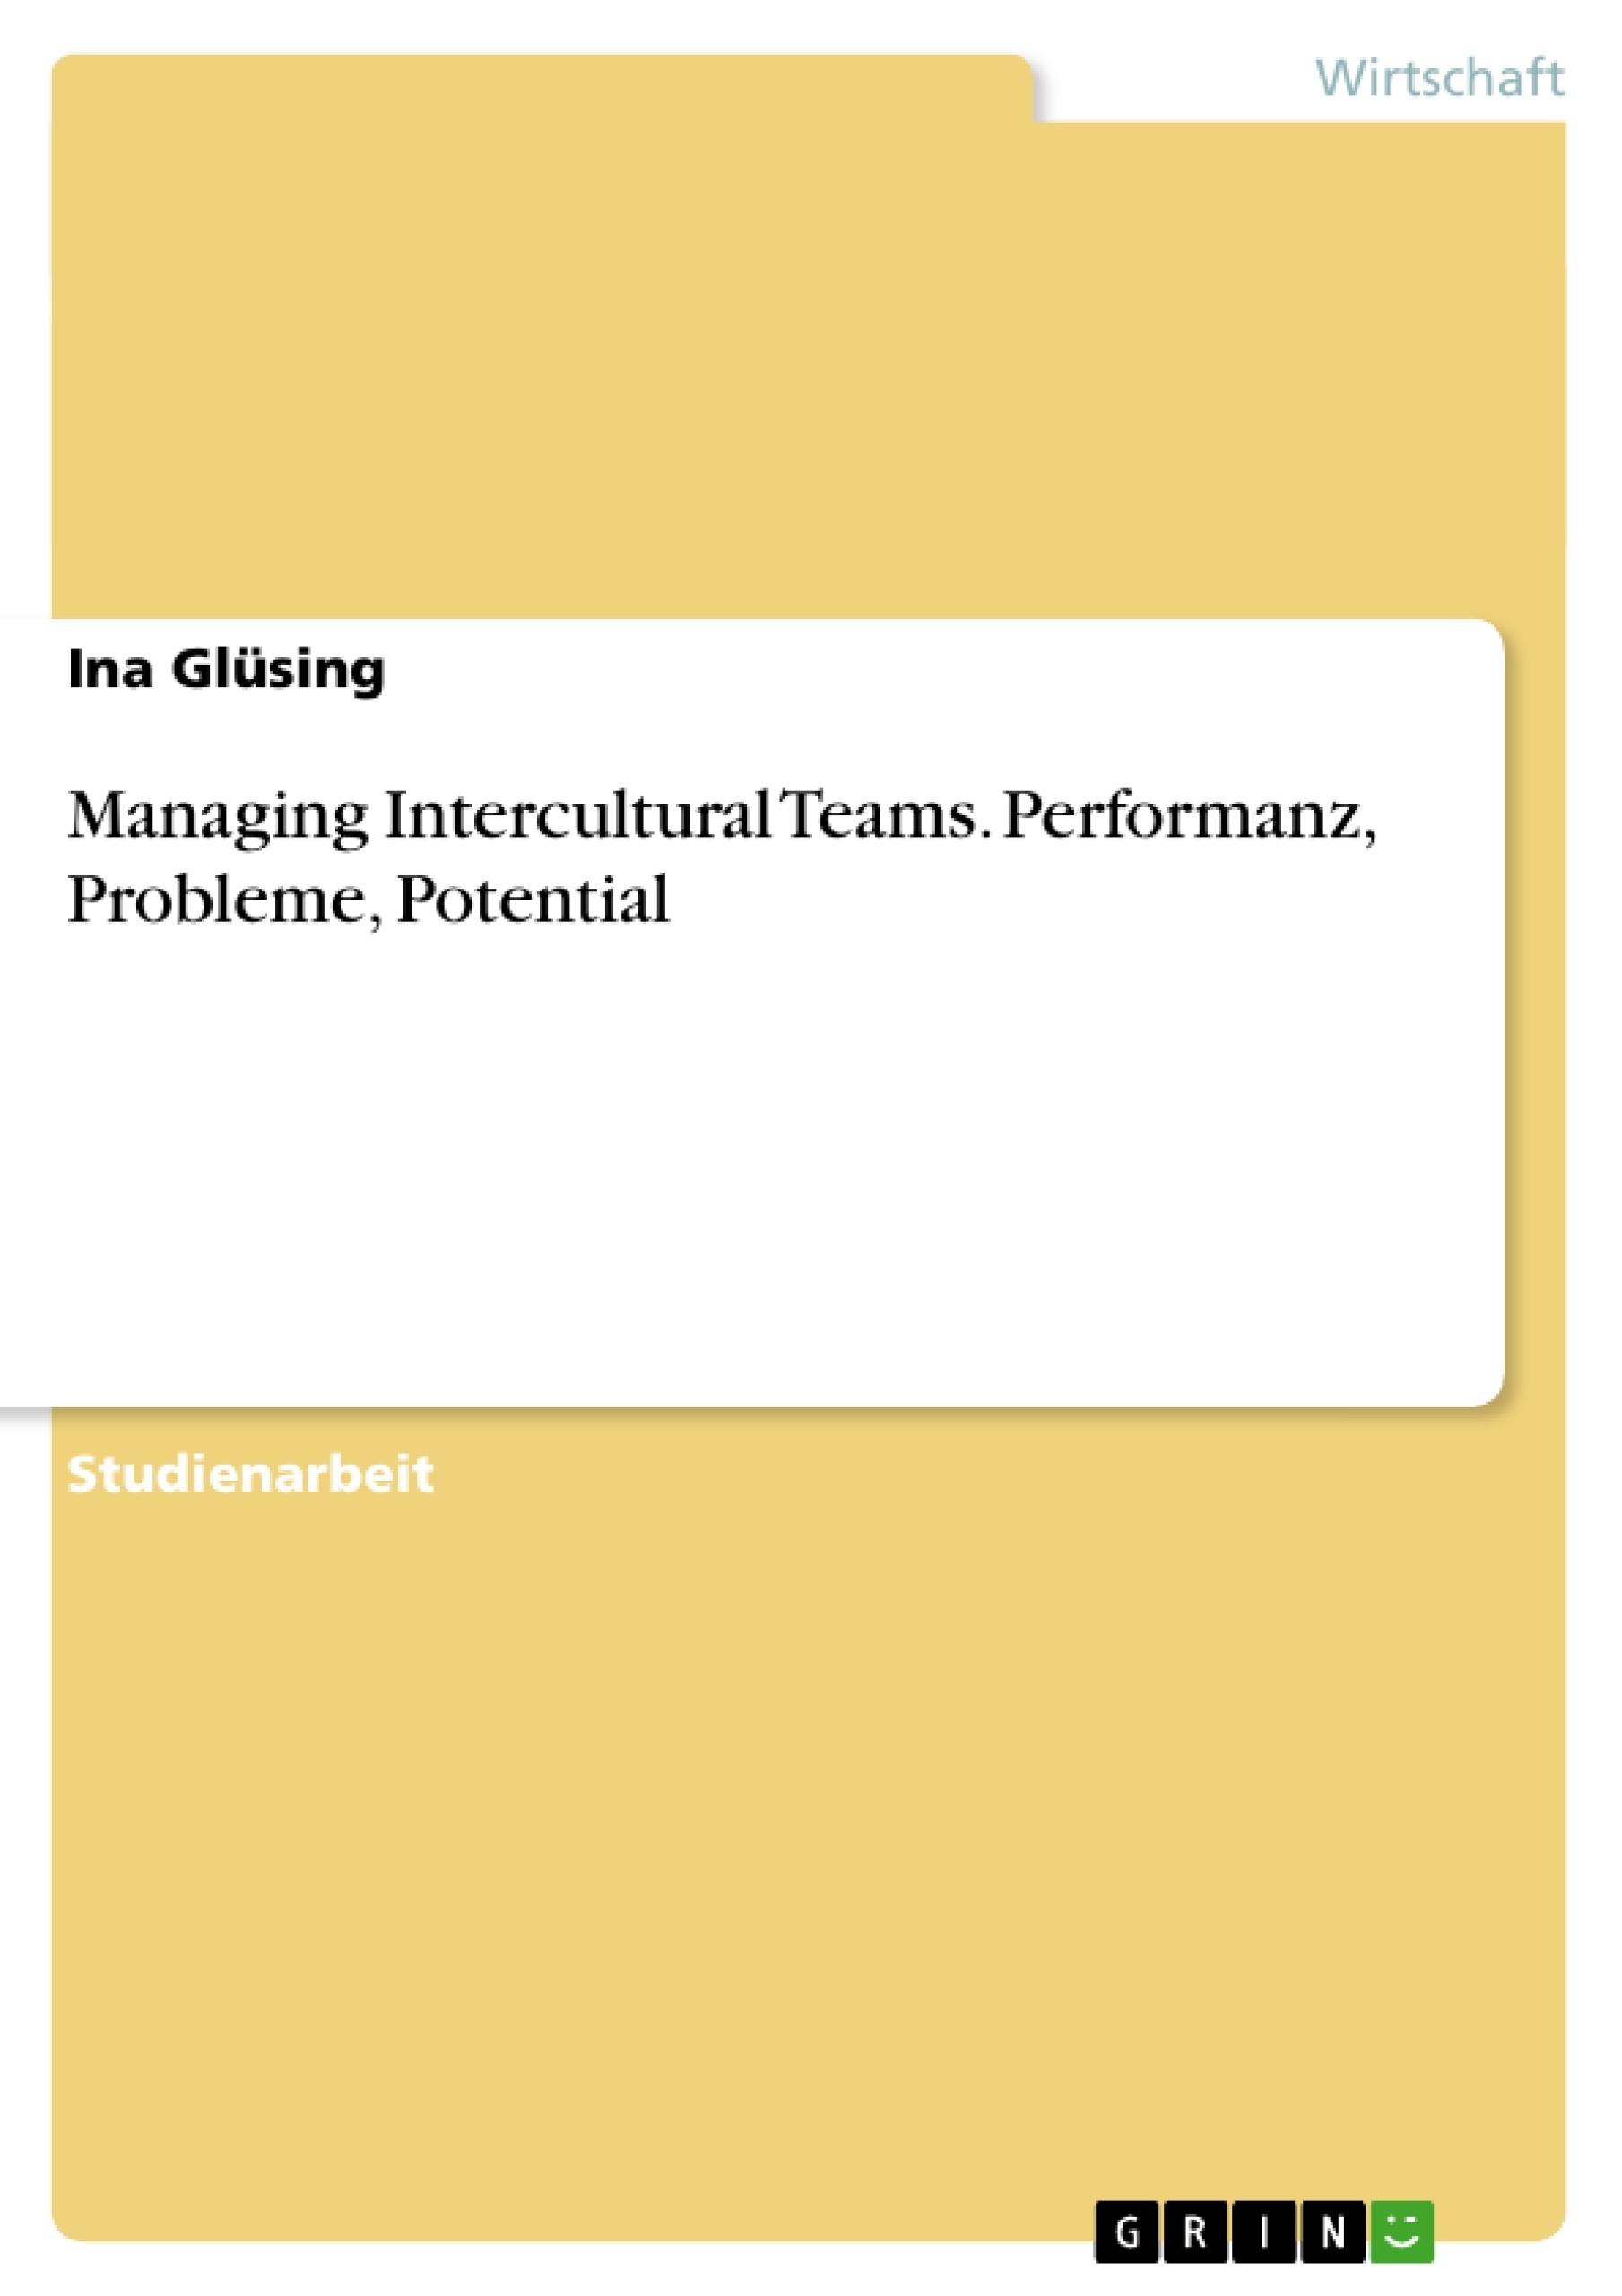 Titel: Managing Intercultural Teams. Performanz, Probleme, Potential